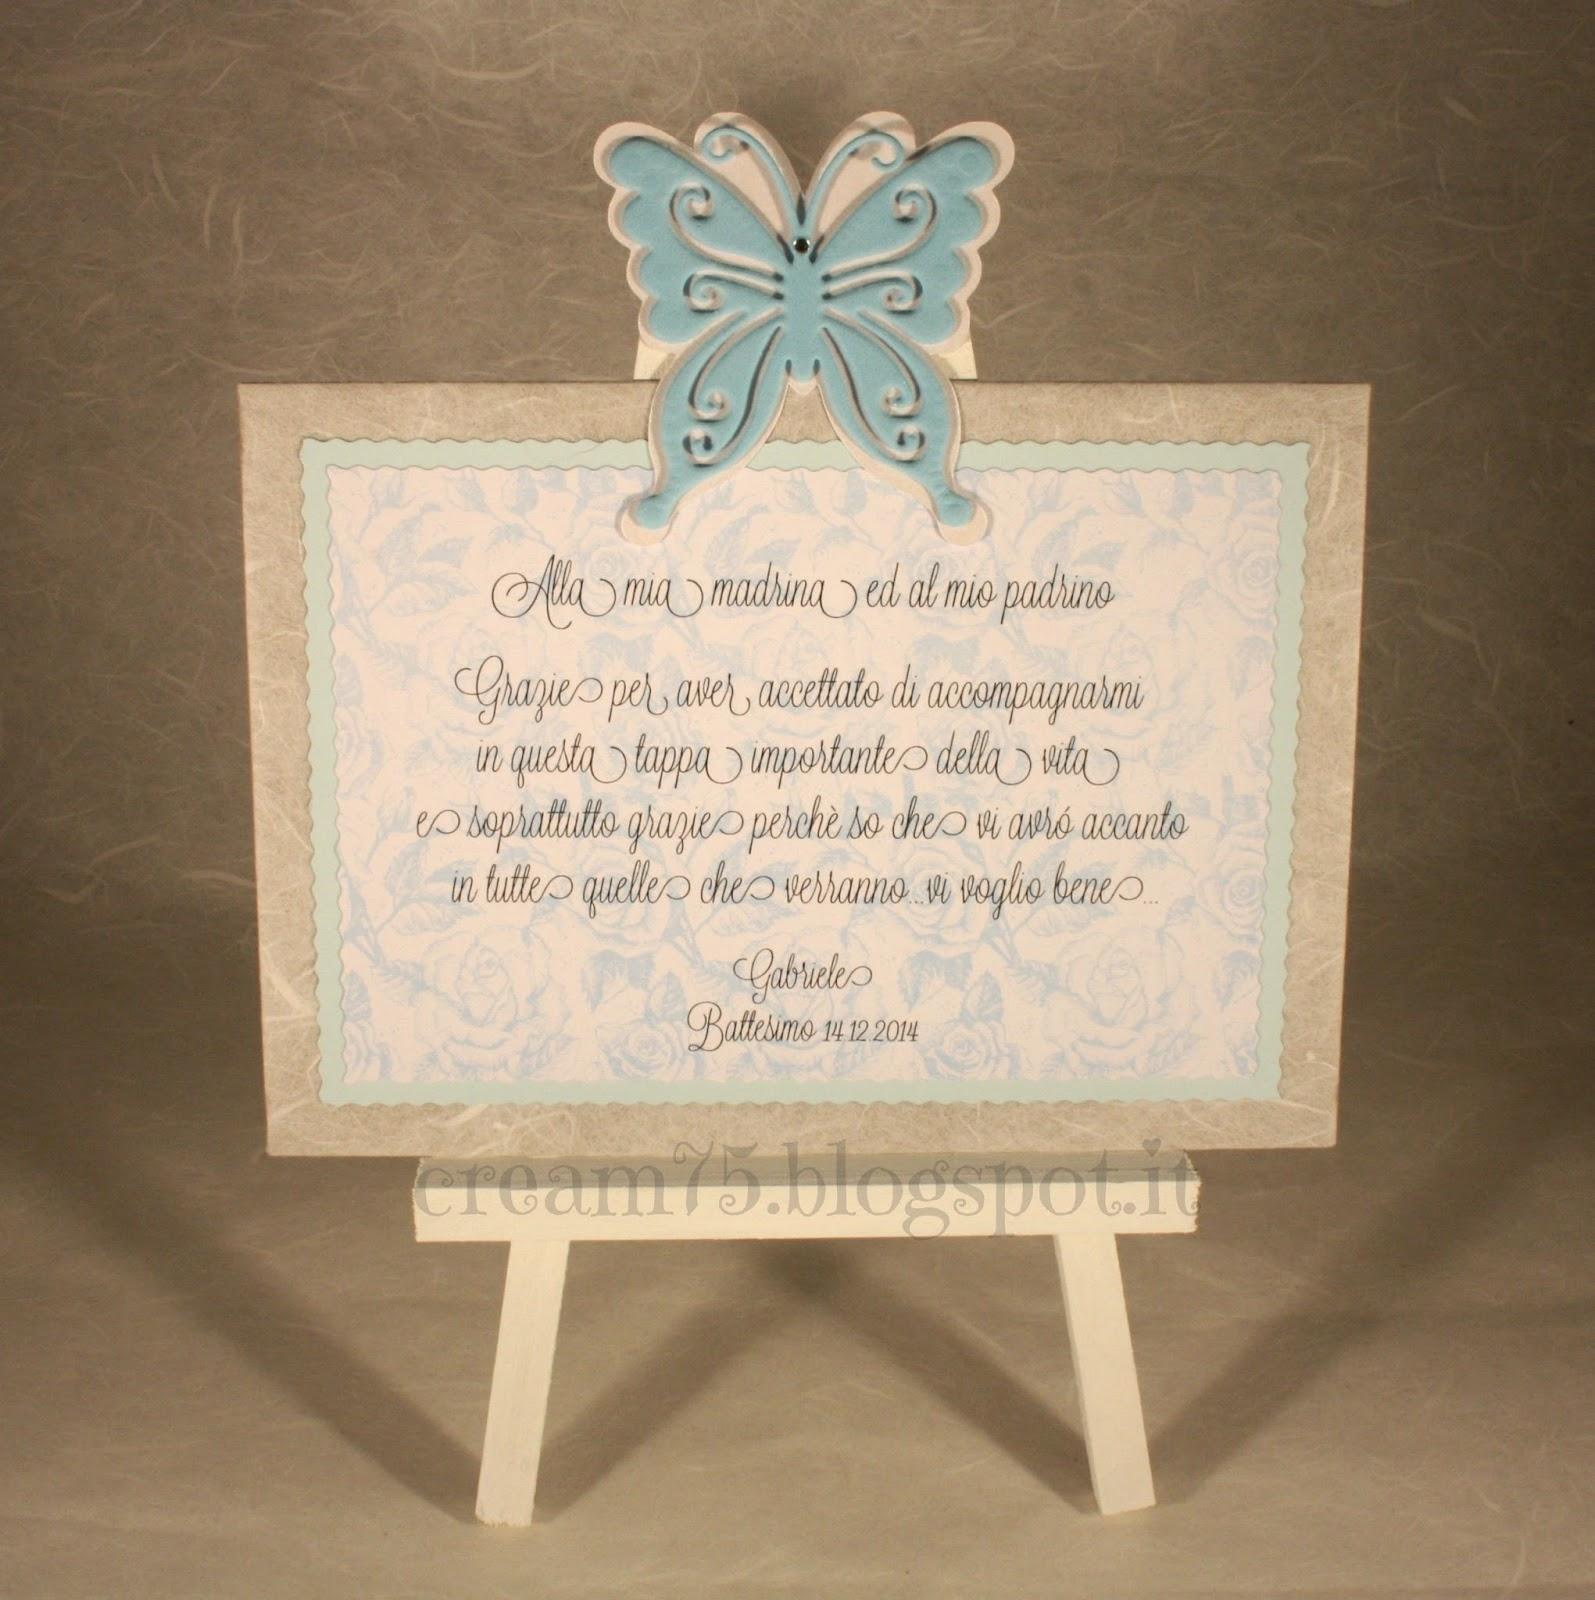 Frasi Auguri Matrimonio E Battesimo Insieme : Frasi per il battesimo di una bimba qx regardsdefemmes